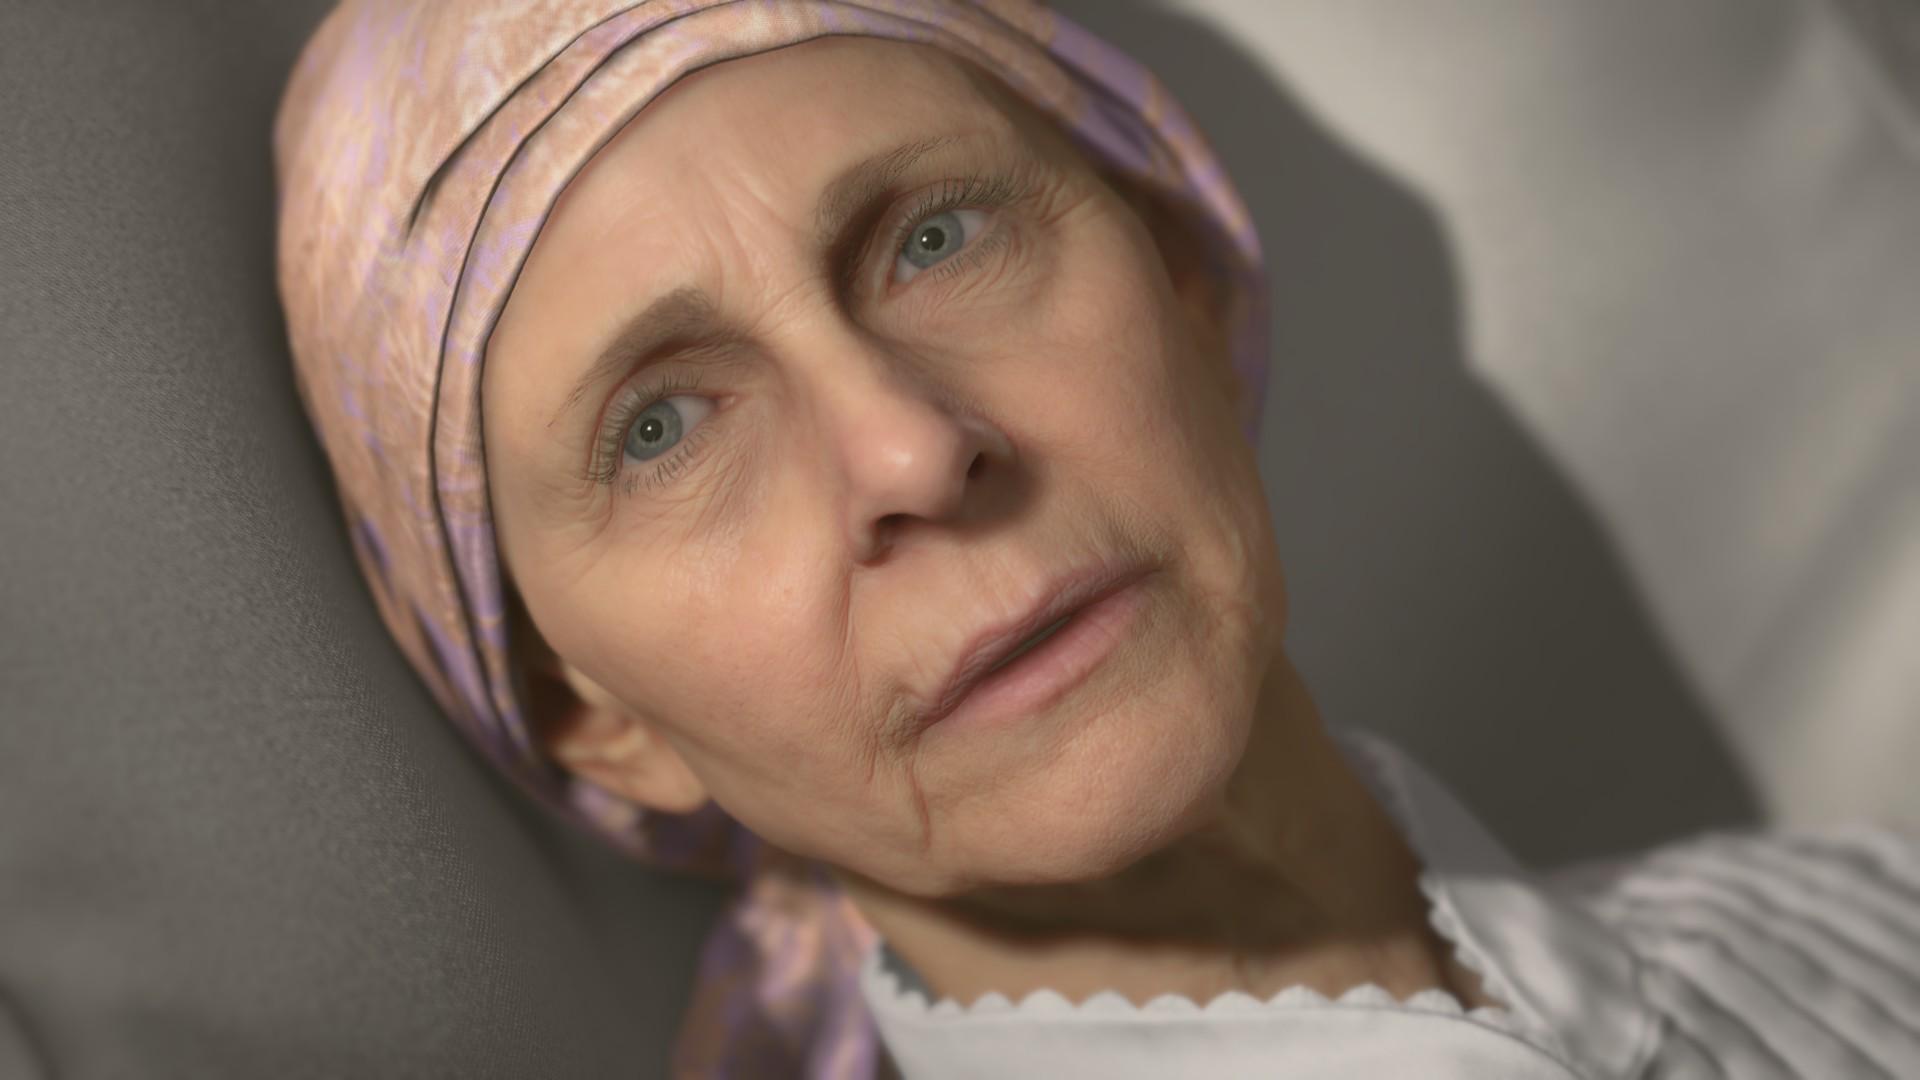 Review Death Stranding Media Formasi Karakter Cewe Nenek